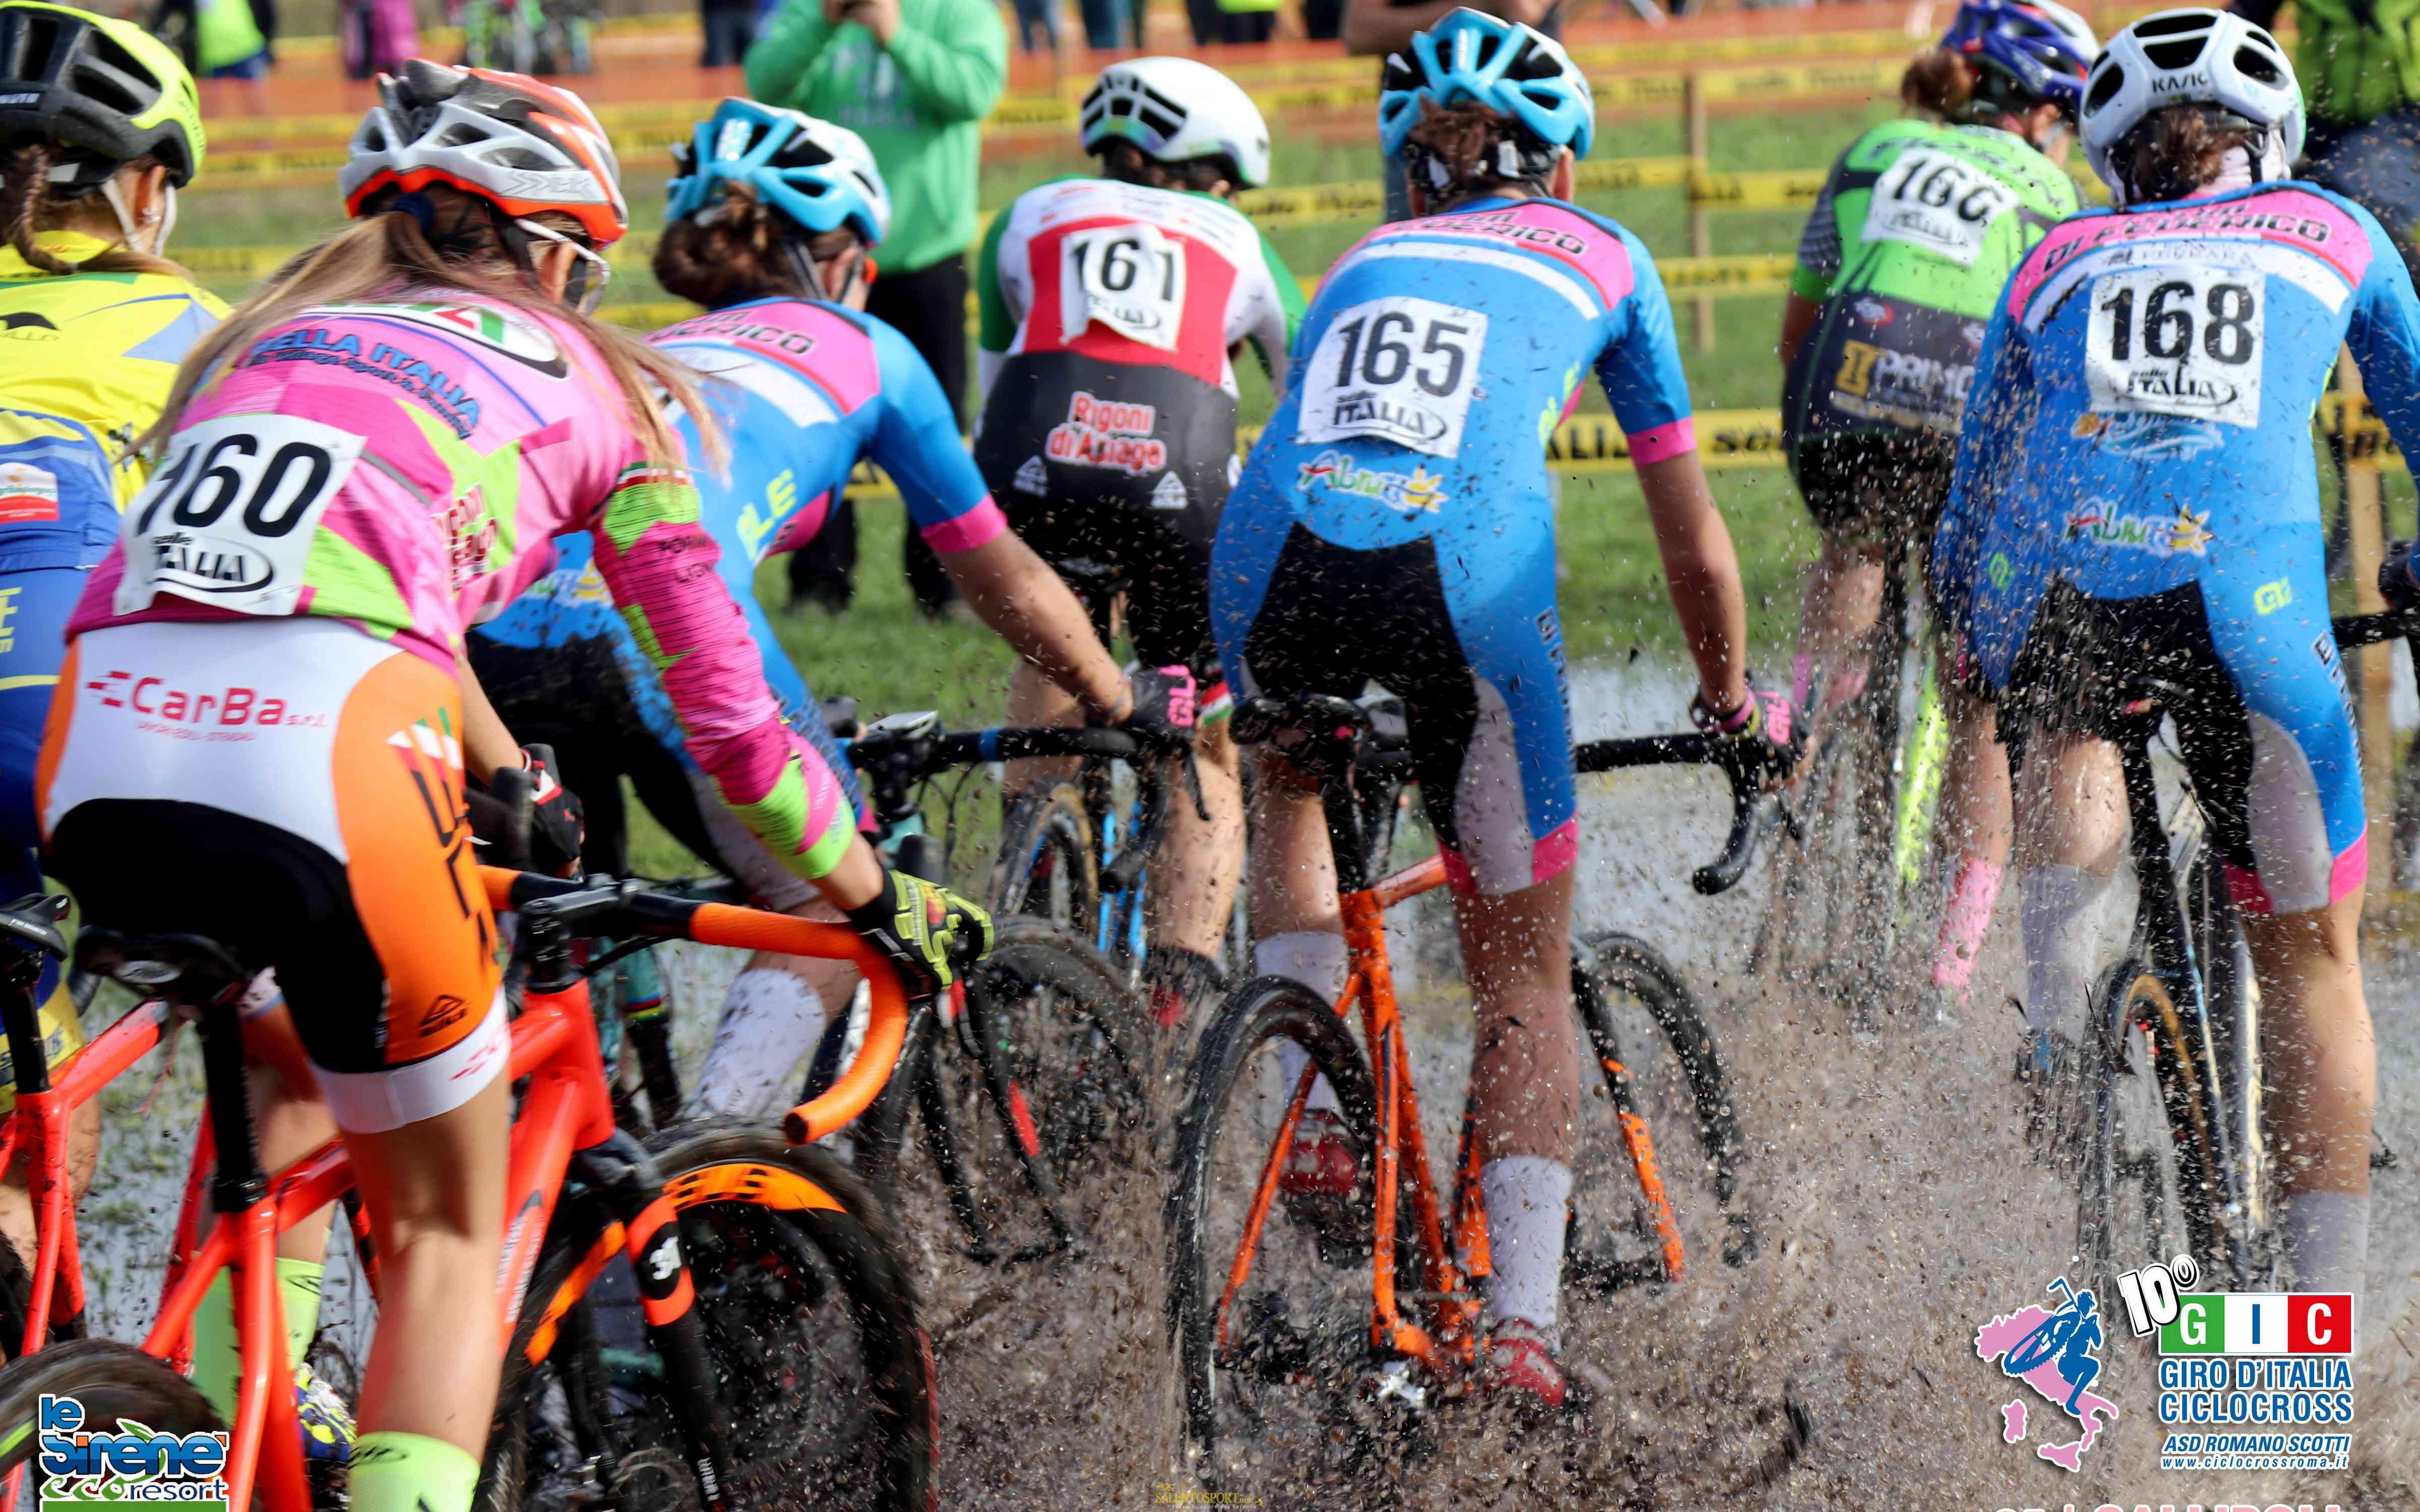 giro-italia-ciclocross-gallipoli-dic-18